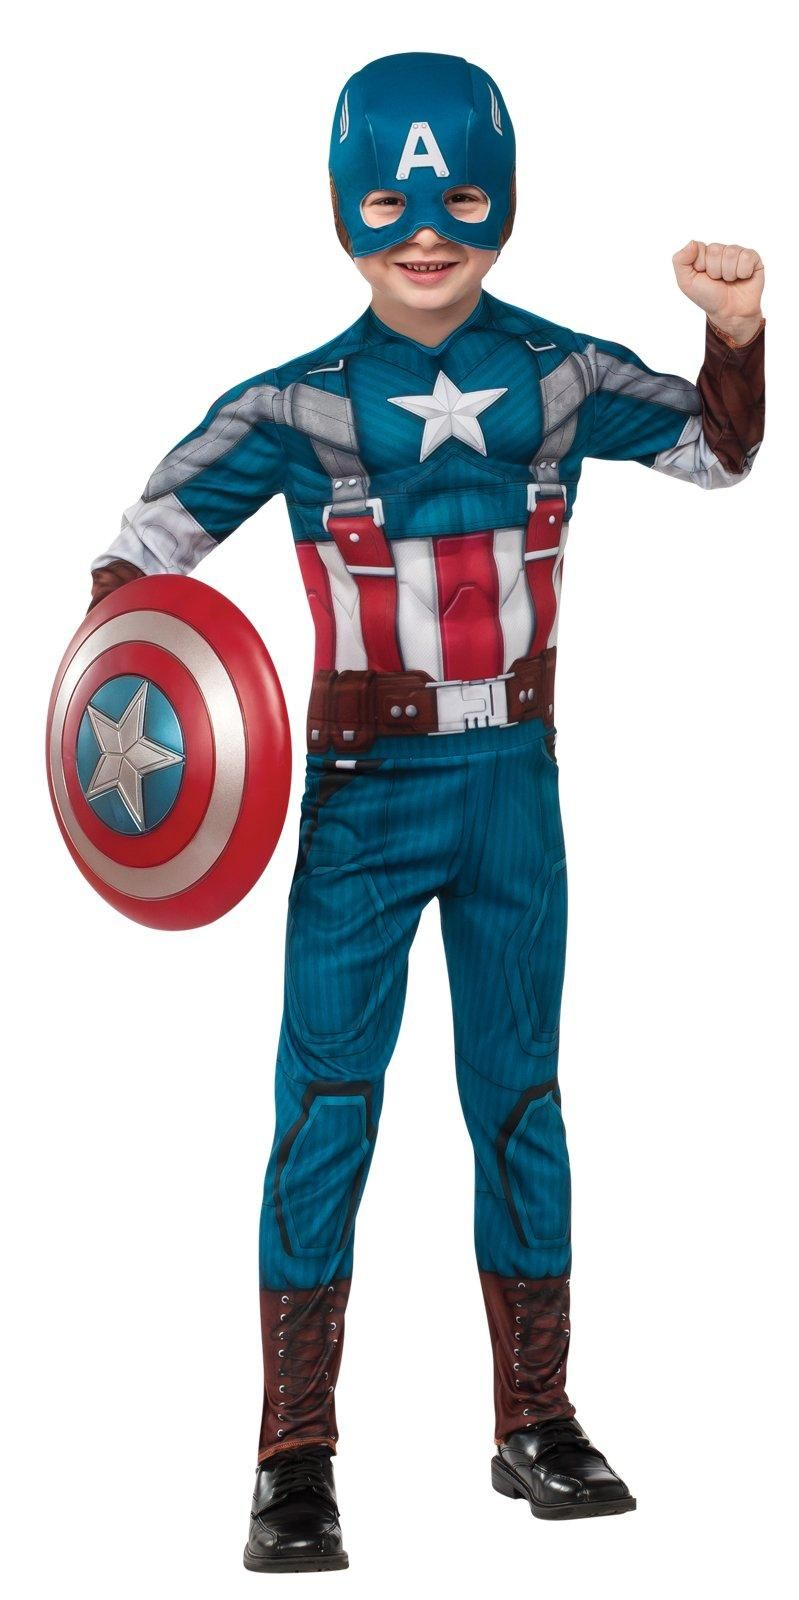 Boys Hawkeye Costume Kids DC comics Marvel Fancy Dress Outfit Licensed Dressup